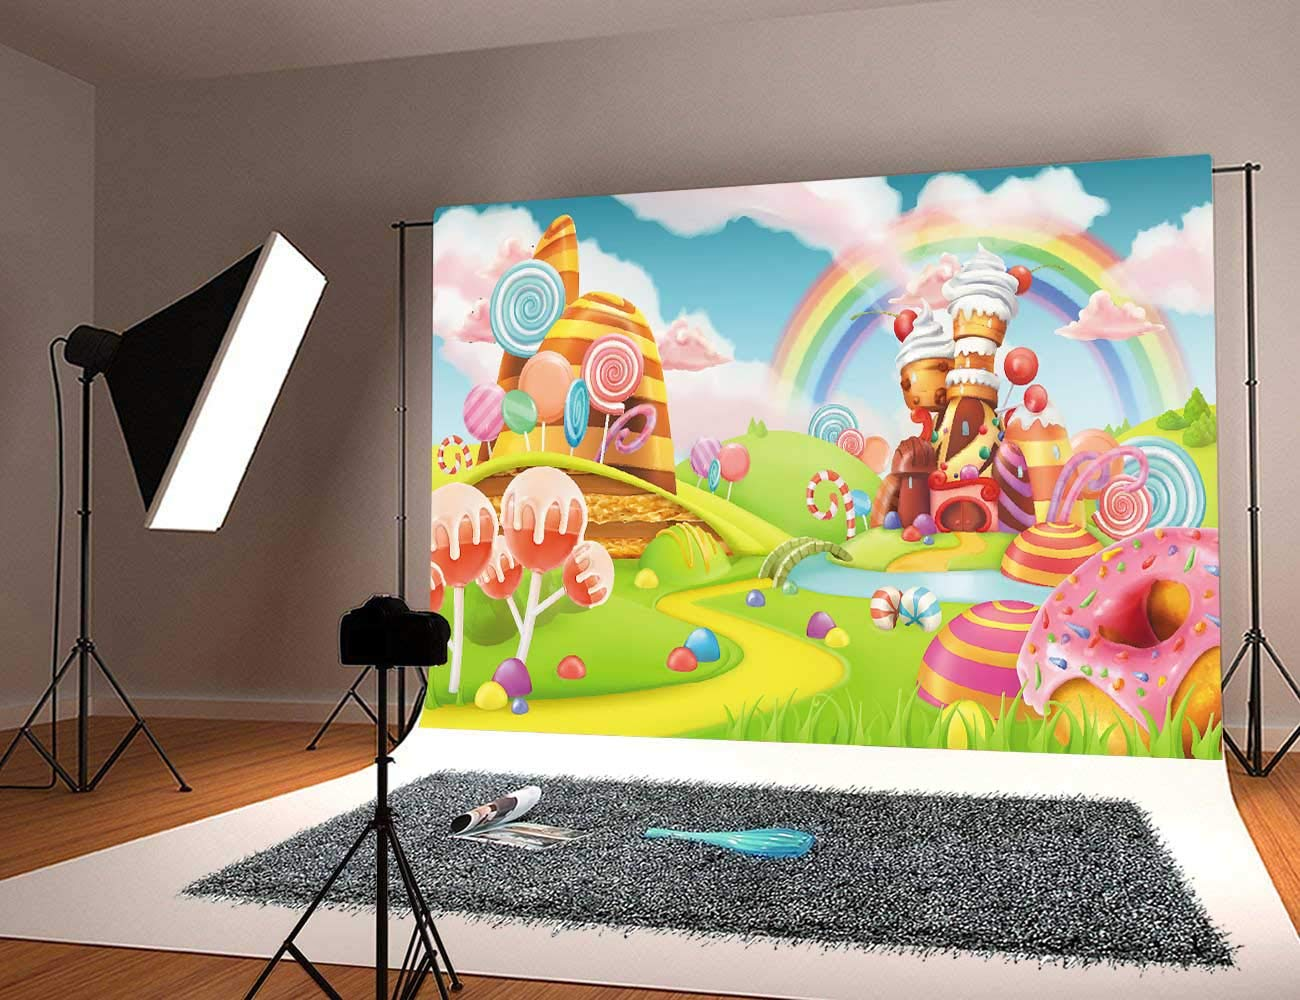 Daniu Sweet Cartoon Background Lollipop Photo Props Rainbow Baby Photography Backdrops Vinyl 7x5FT 210cm X 150cm Daniu-JP081